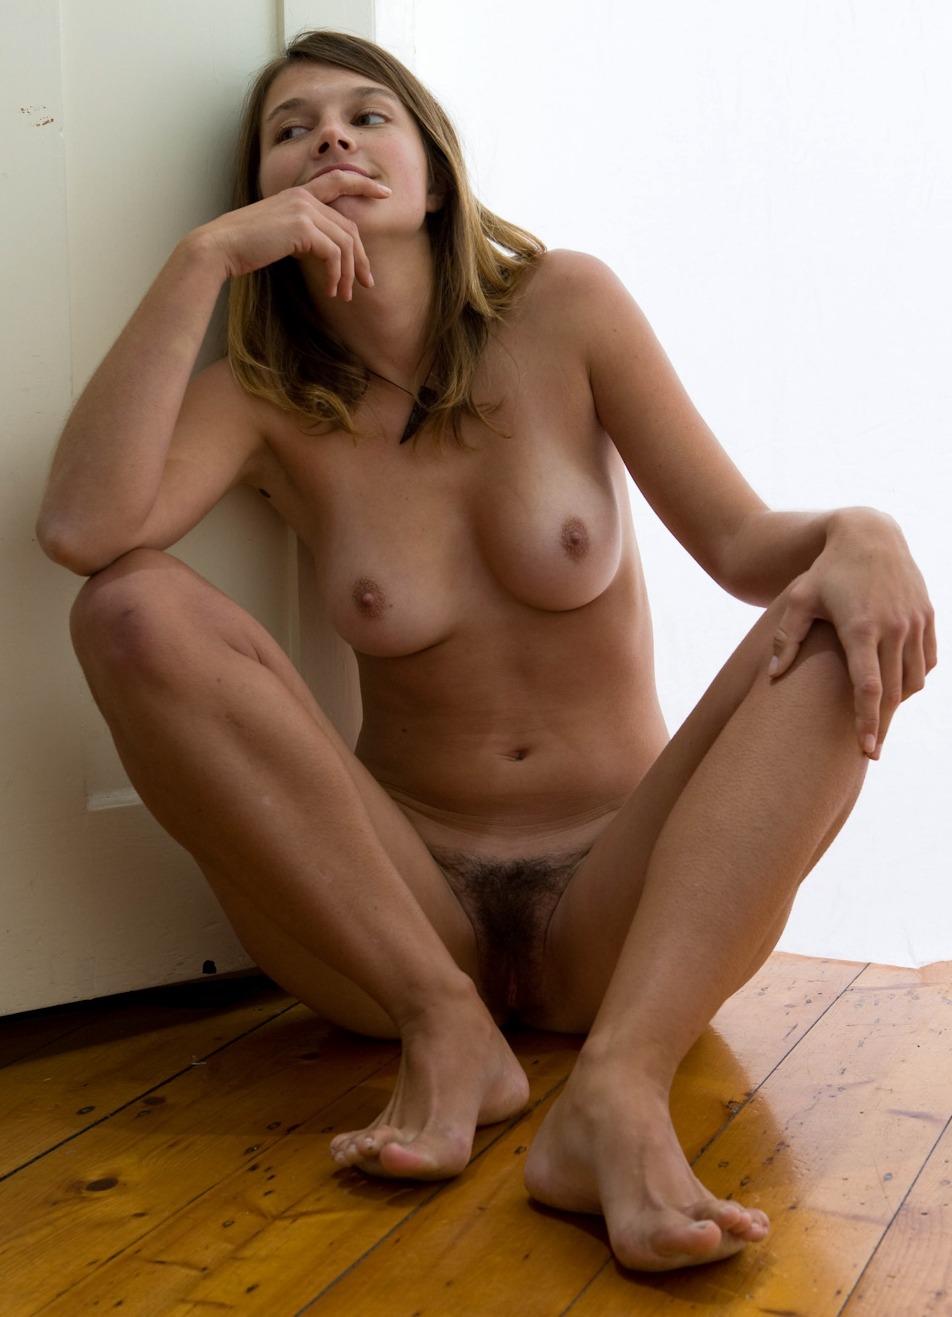 hairy Beautiful nude pussy girls